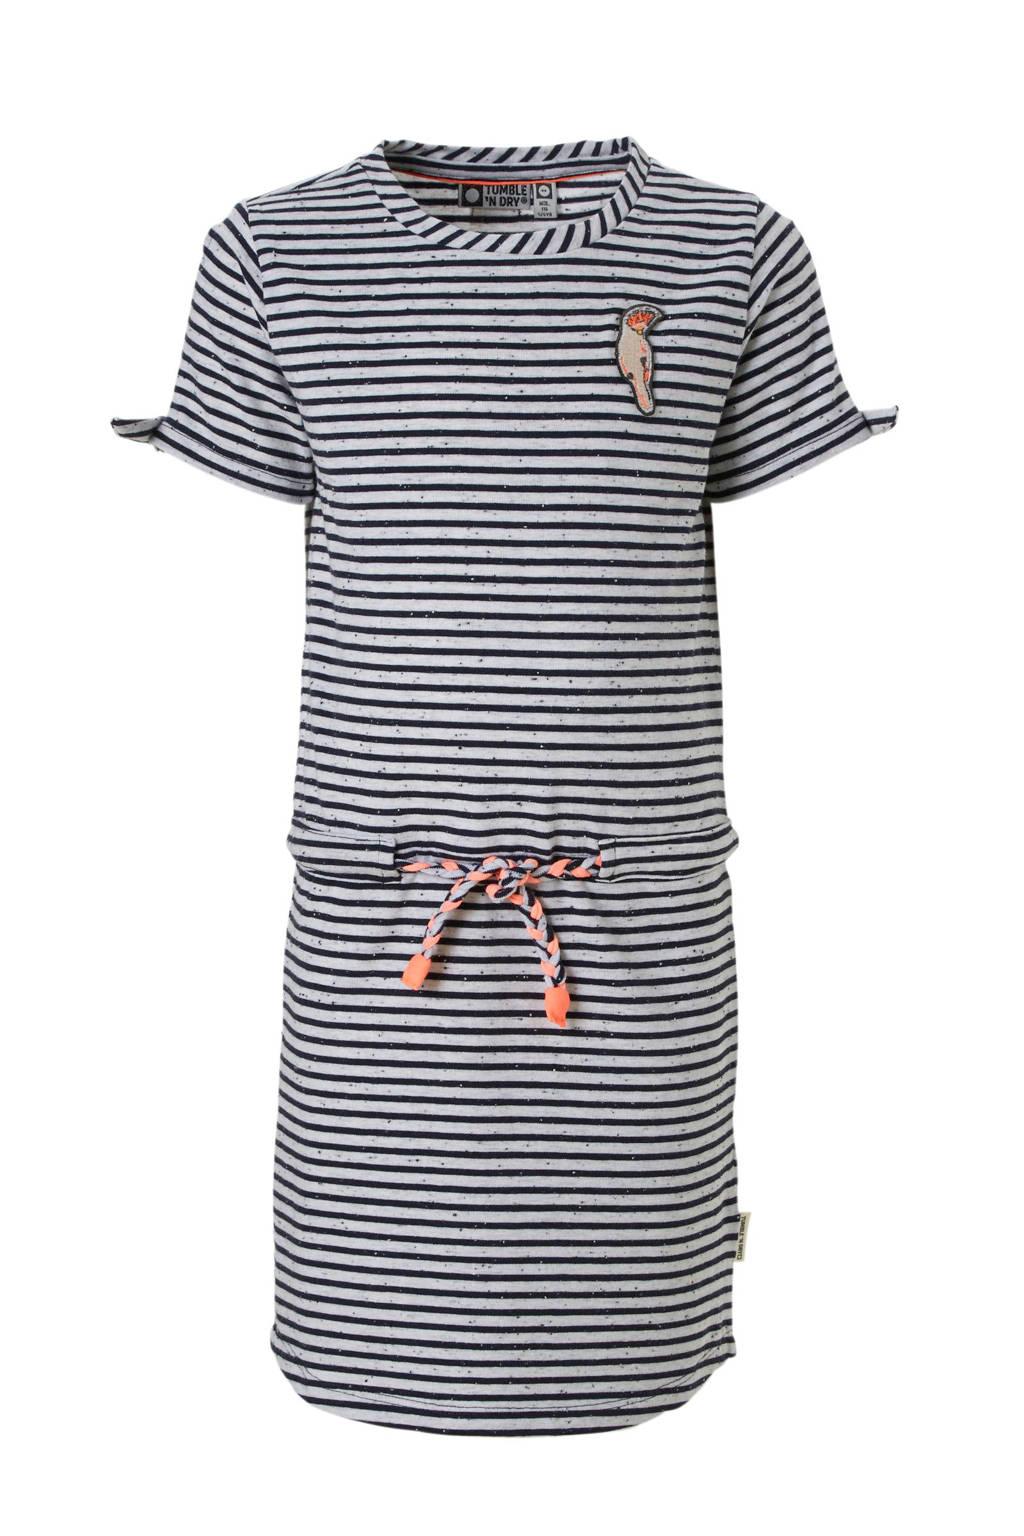 Tumble 'n Dry Mid gestreepte jurk grijs, Grijs/blauw/roze